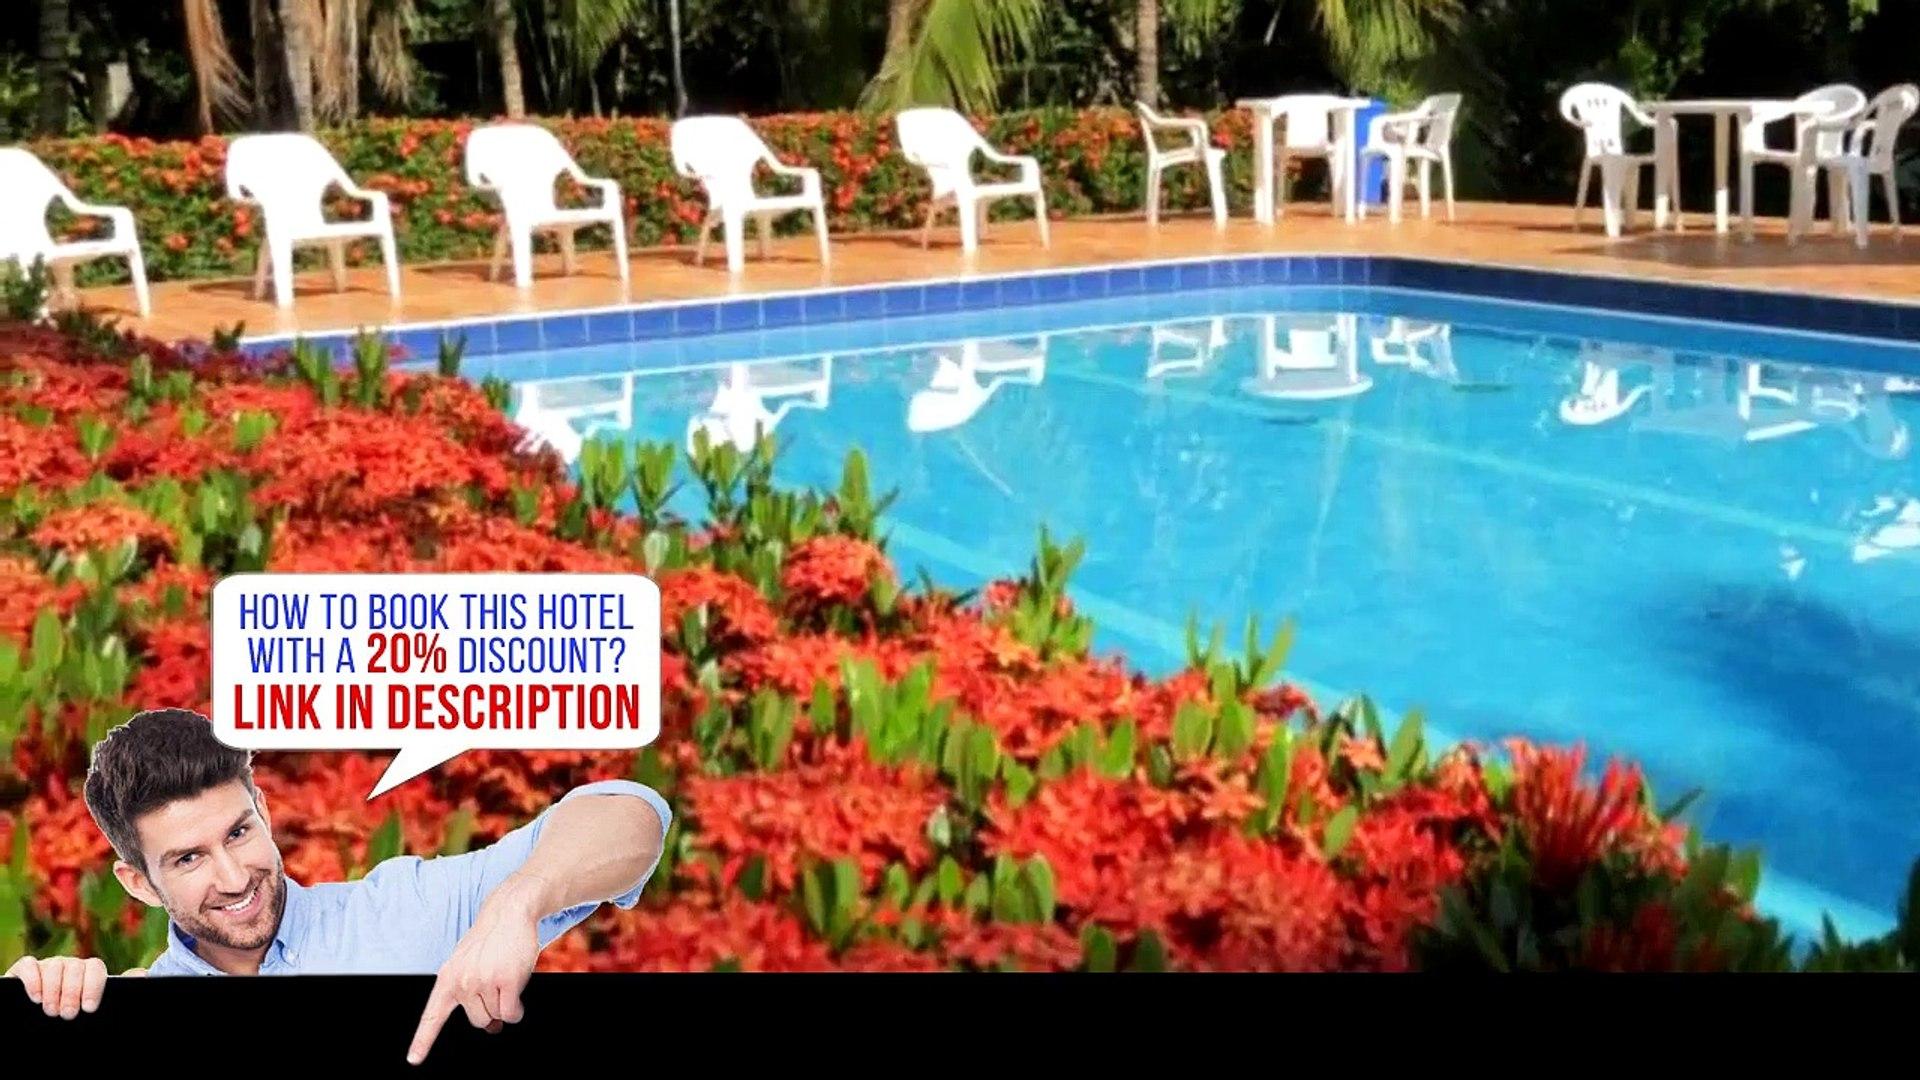 Finca Hotel Morichal Santa Fe, Santa Fe de Antioquia, Colombia, HD Review